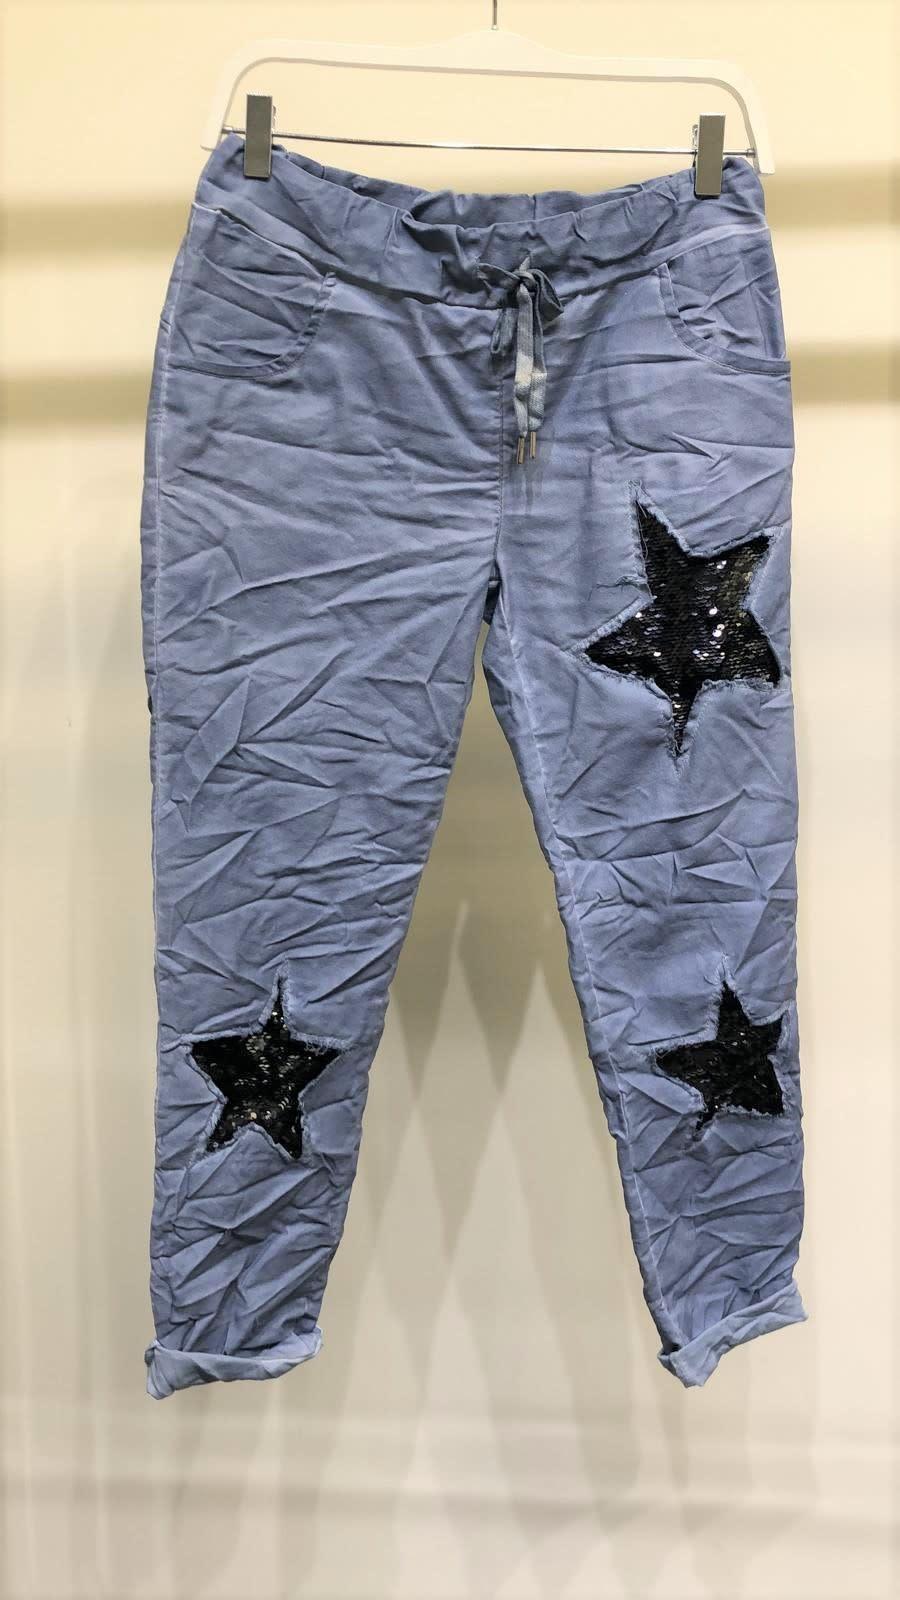 Sequin Star Crinkle Jogger